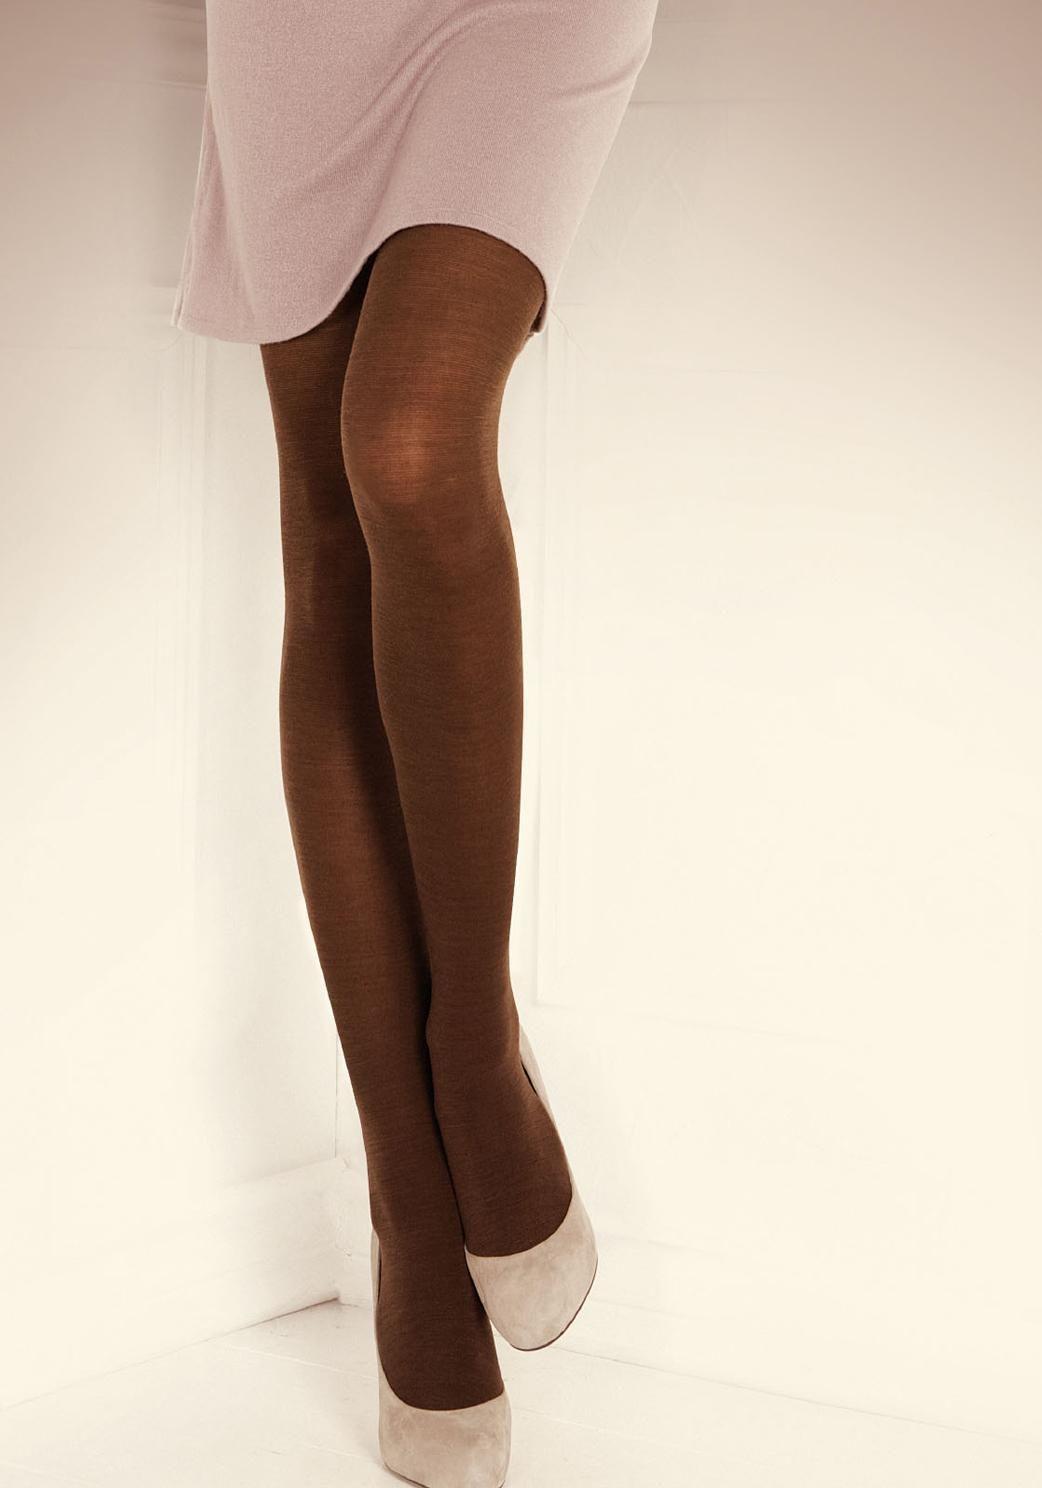 637c6690beb37 SISI Naturalflip Wool Tights Wool Tights, Cashmere, Panty Hose, Cashmere  Wool, Woolen